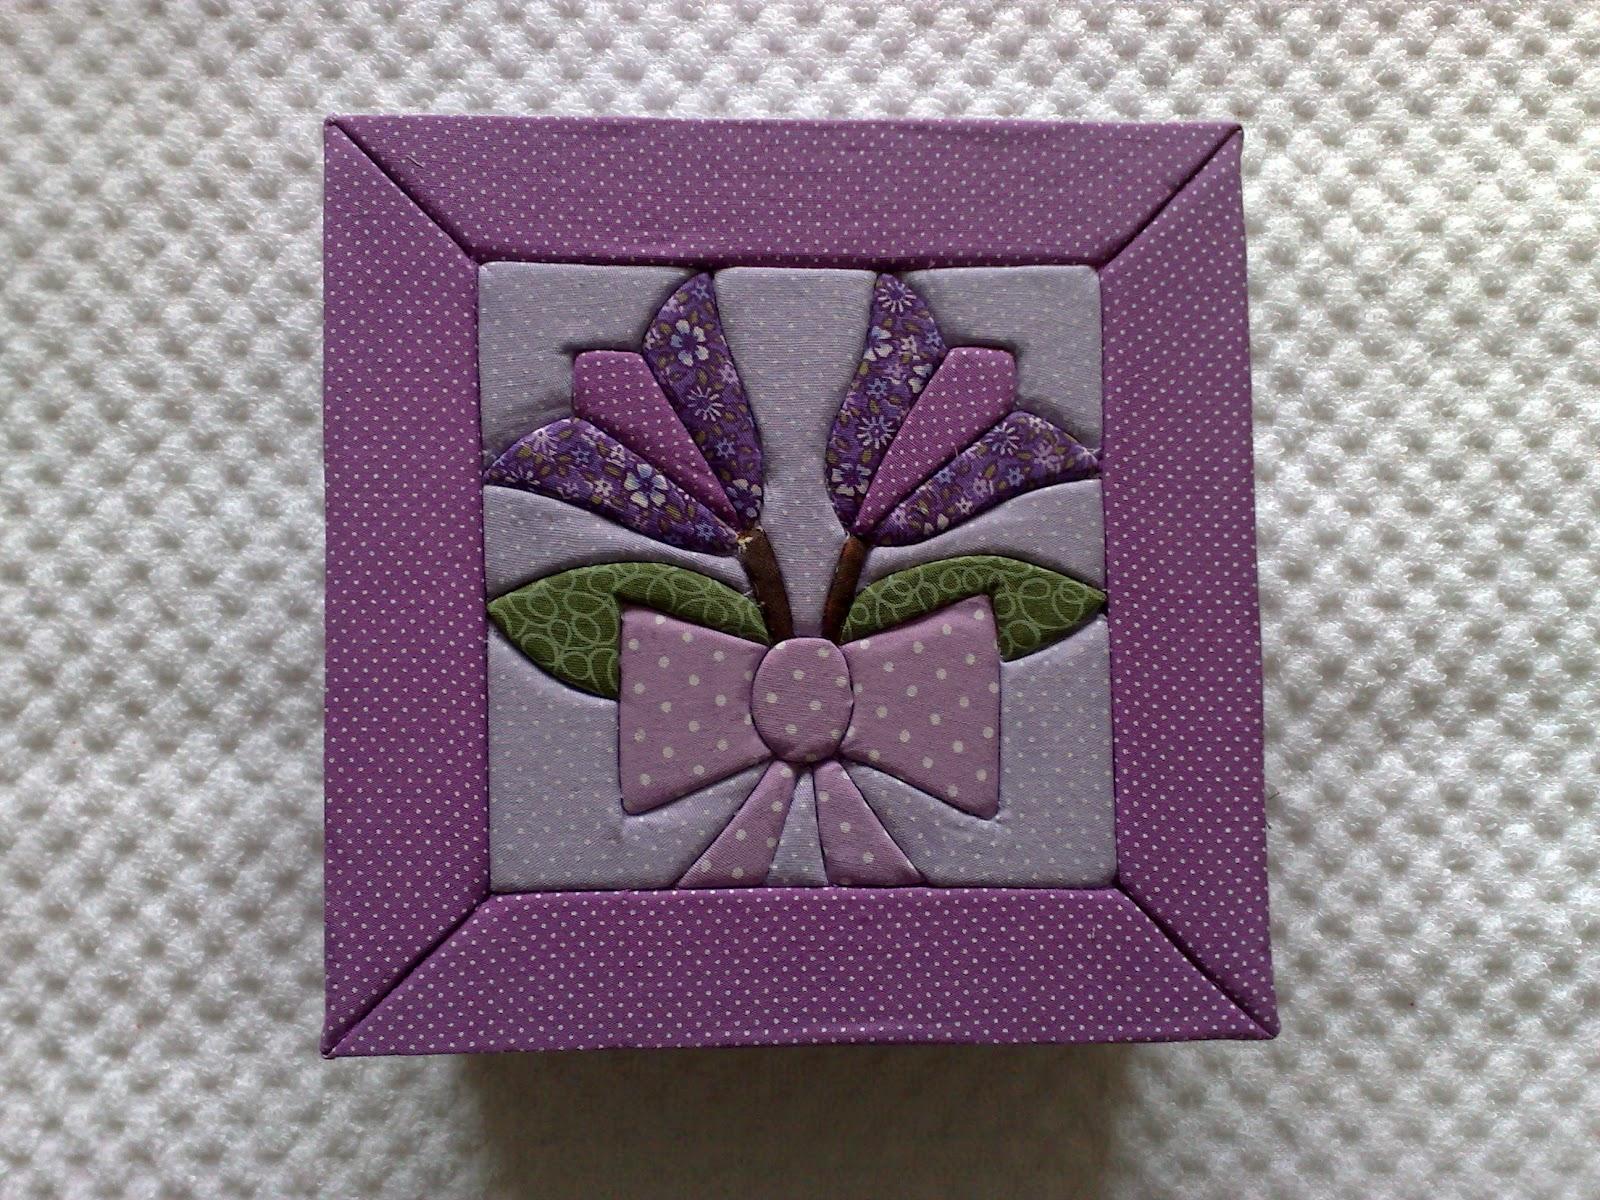 Artesanatos da Meri: Caixa MDF: técnica isopor pluma #593150 1600 1200